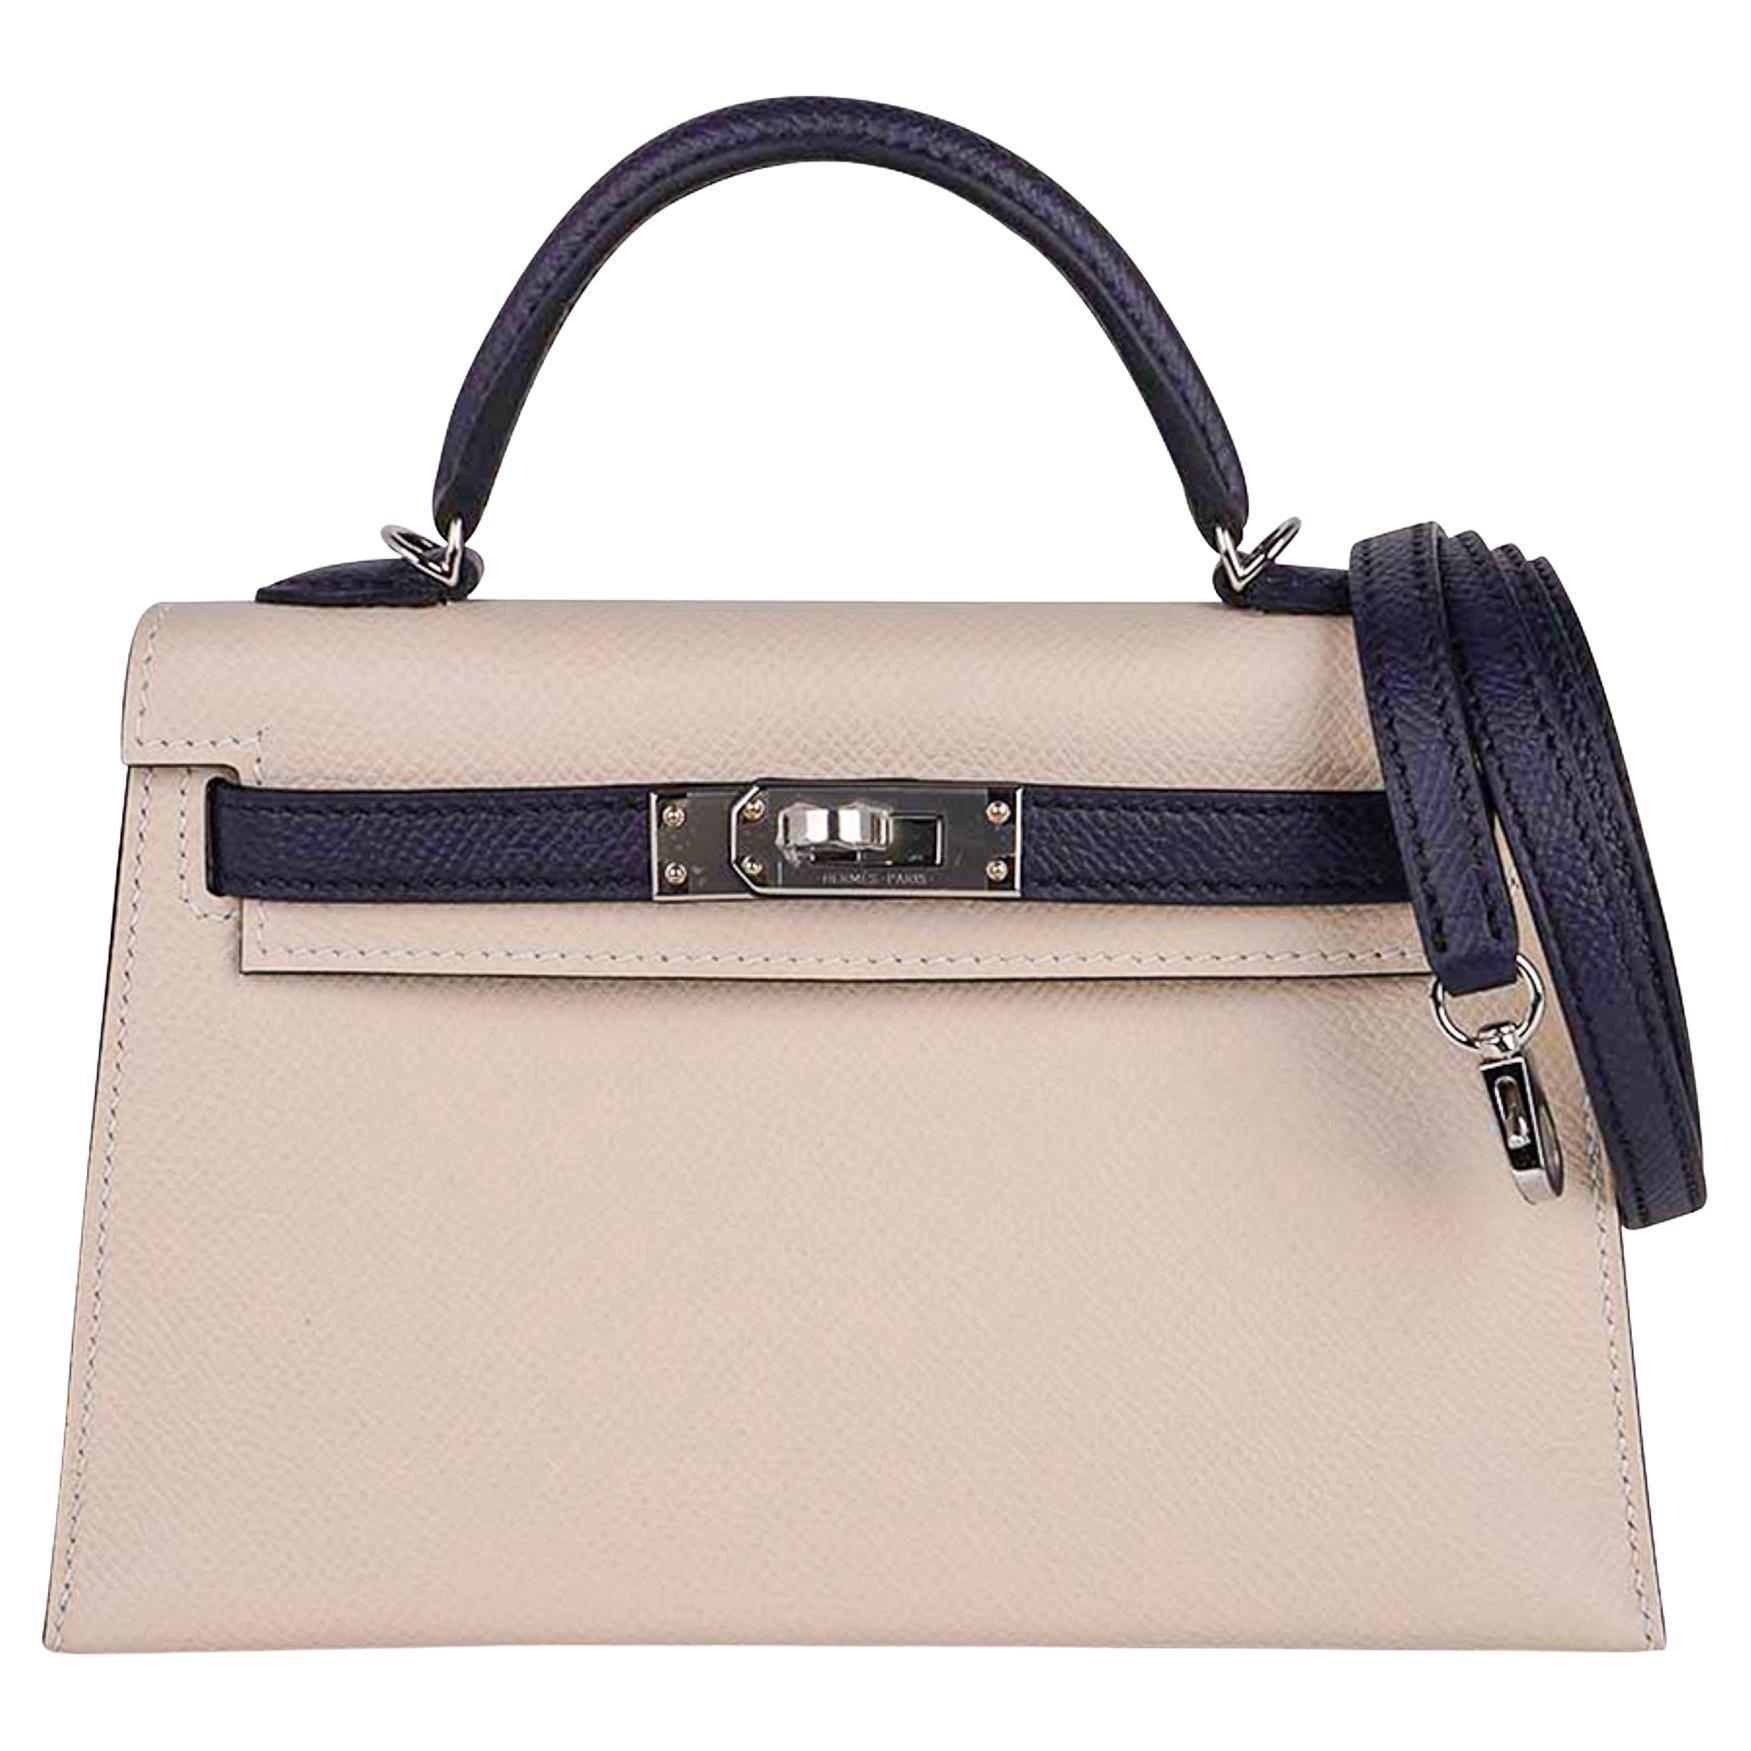 Hermes Kelly Sellier HSS 20 Mini Bag Craie / Bleu Indigo Epsom Palladium